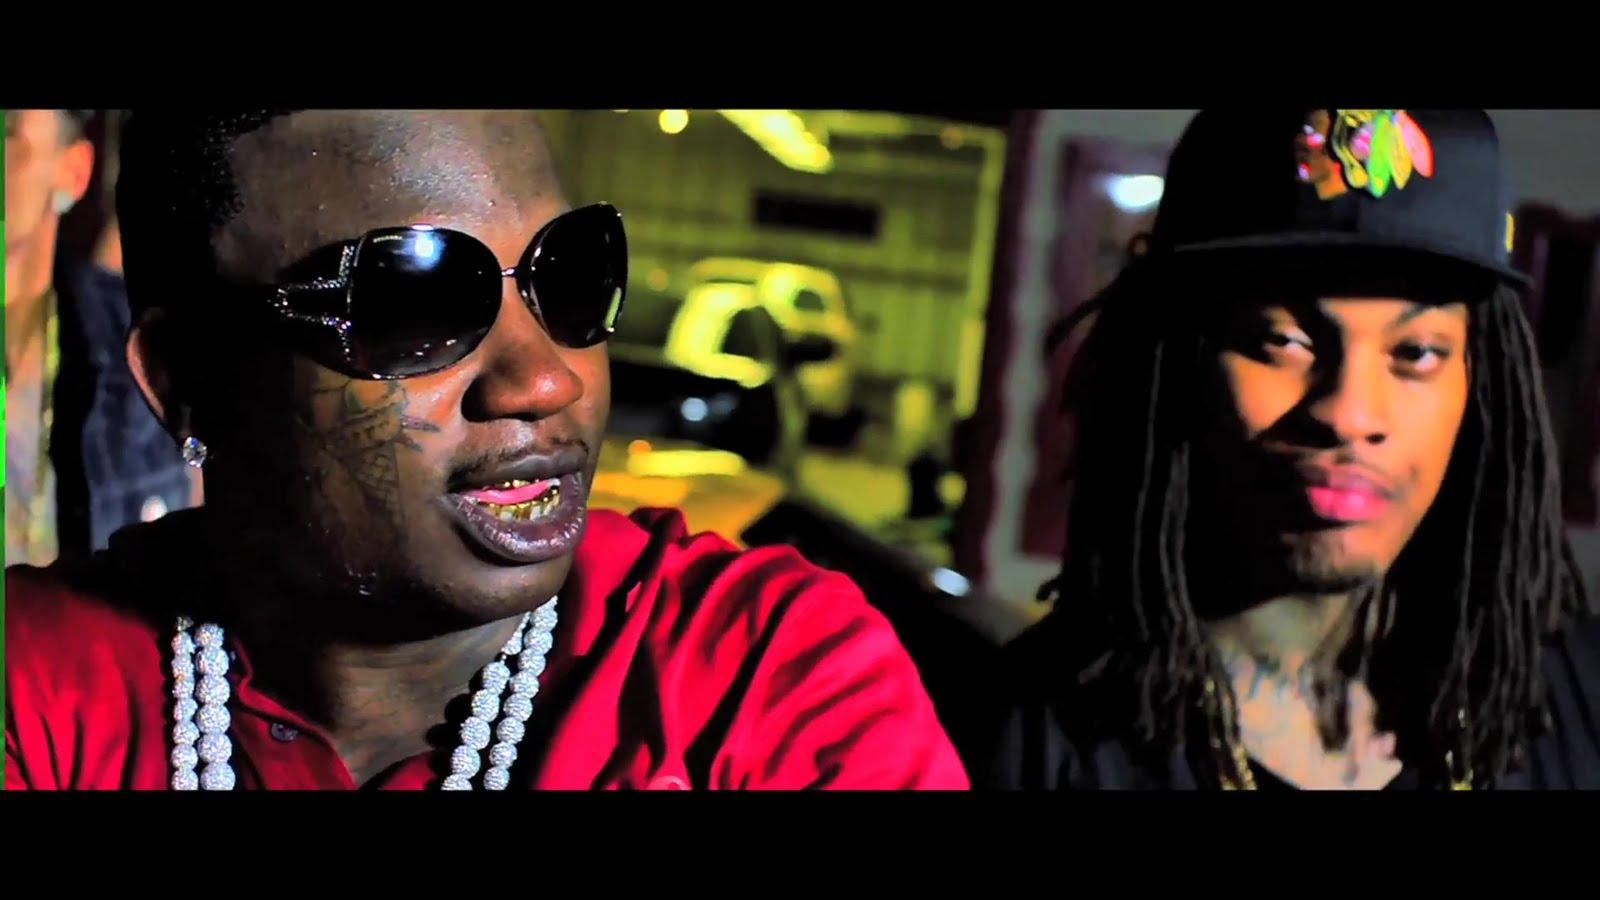 Hiphopdisc Gucci Mane Feat Waka Flocka Flame Ferrari Boyz